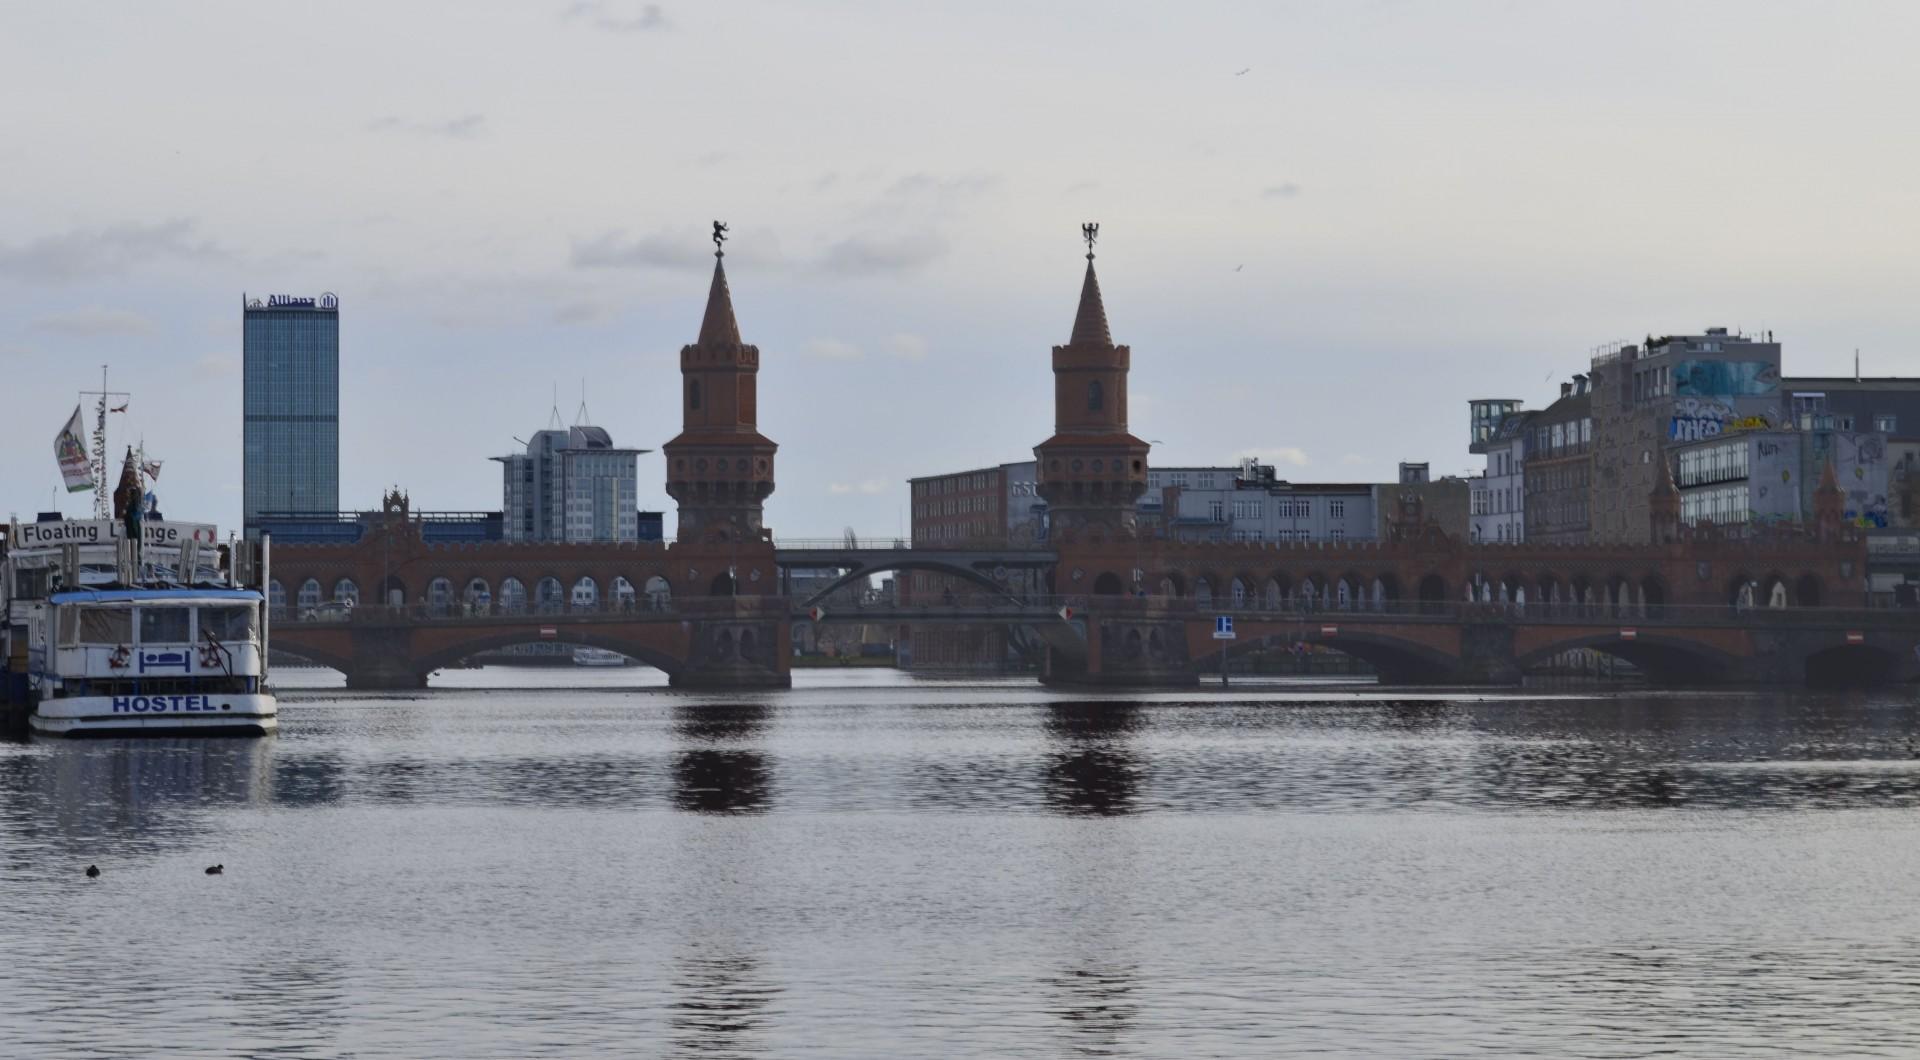 Oberbaumbrücke-clareada-e-cortada-1920x1060